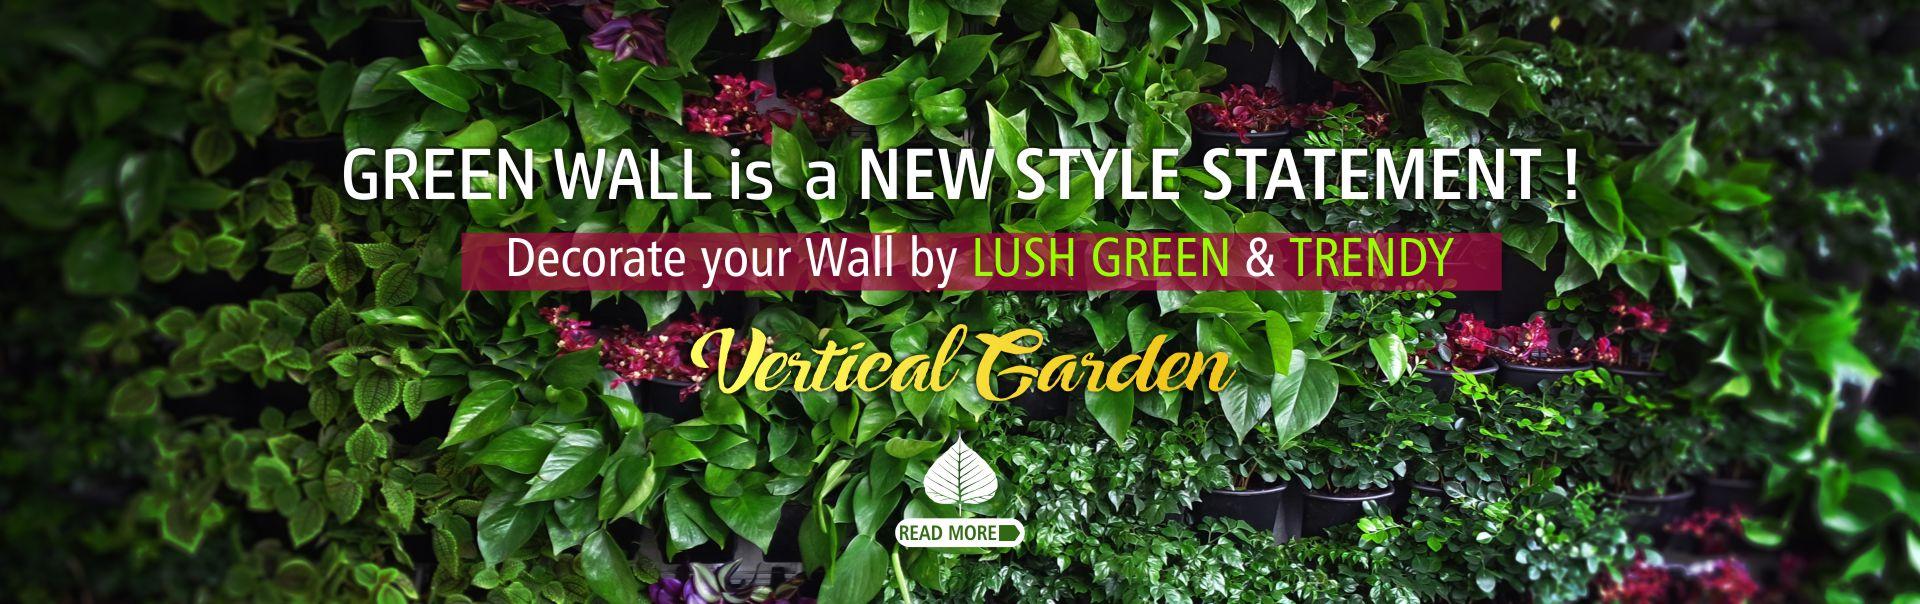 Vertical Garden Green Wall Delhi Gurgaon Noida India